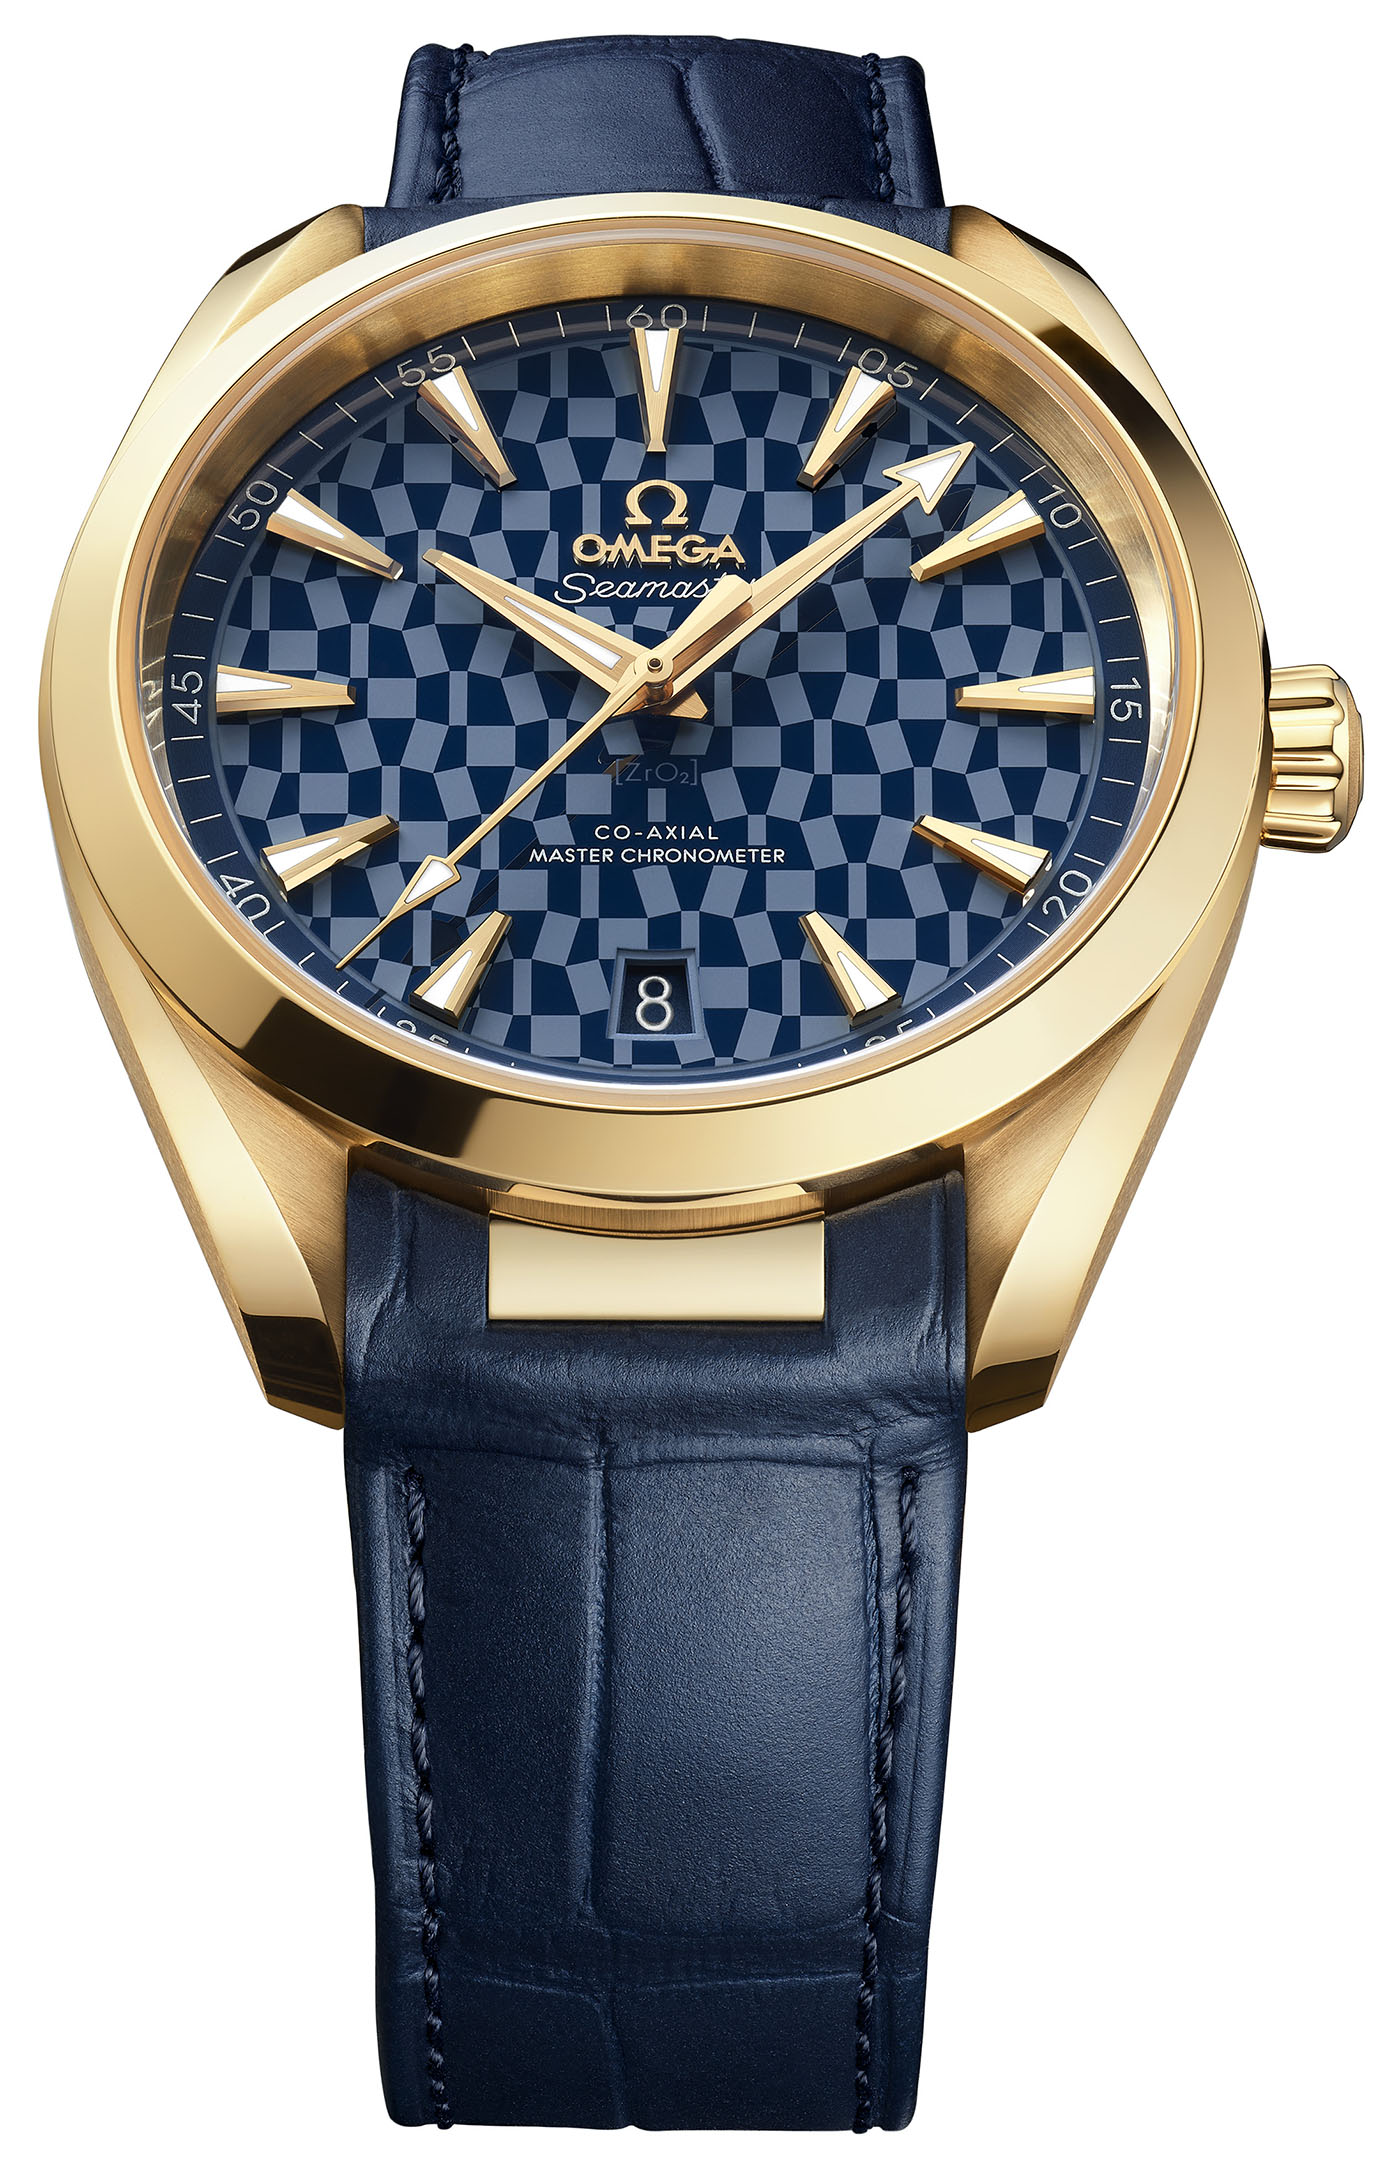 Omega представила золотые часы Seamaster Aqua Terra Tokyo 2020